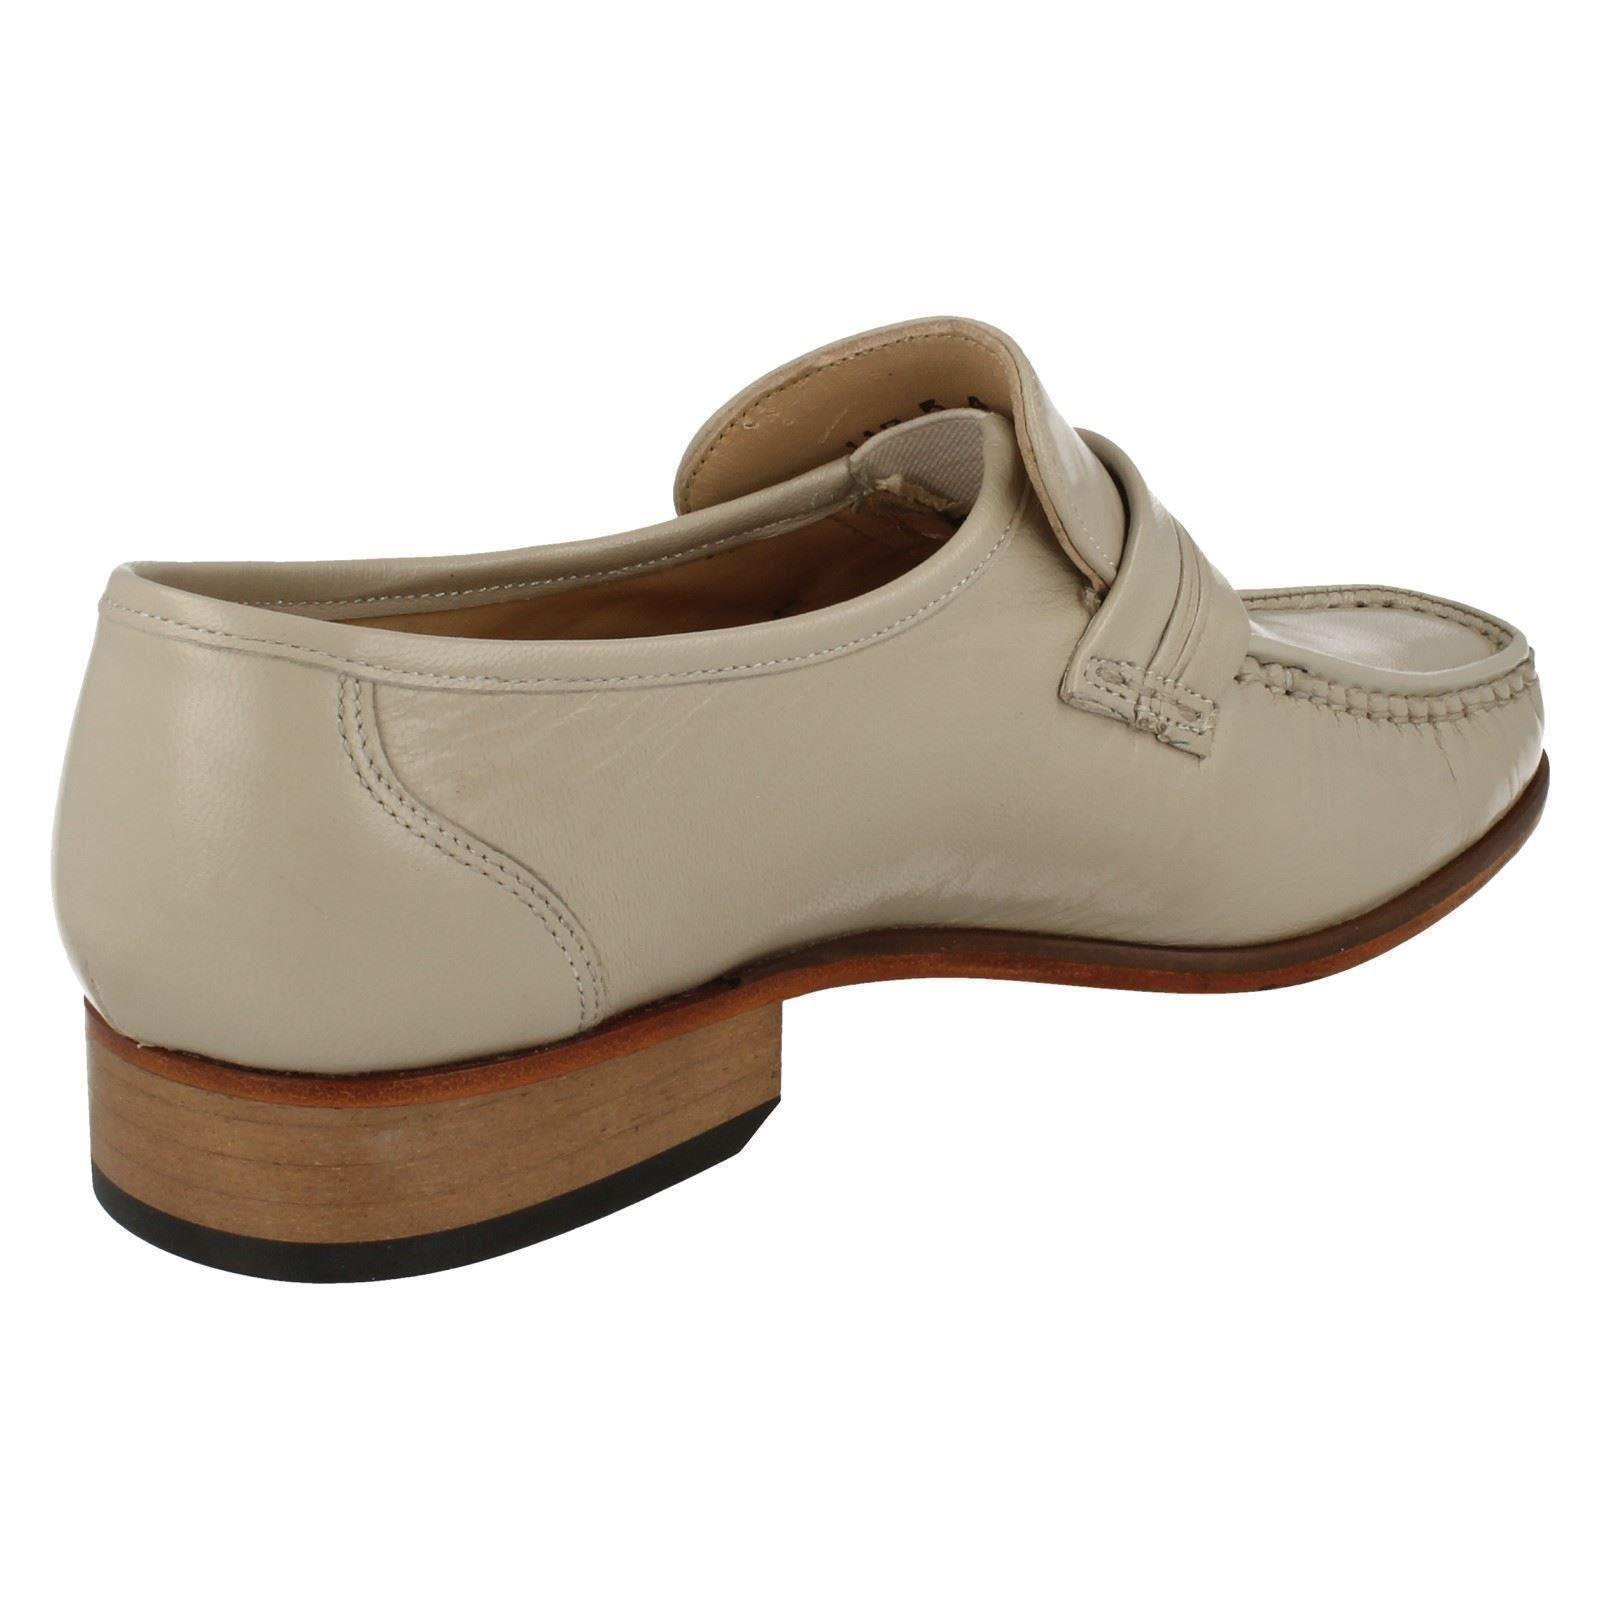 'Mens Grenson' Square Front Smart Slip On Shoes - Clapham